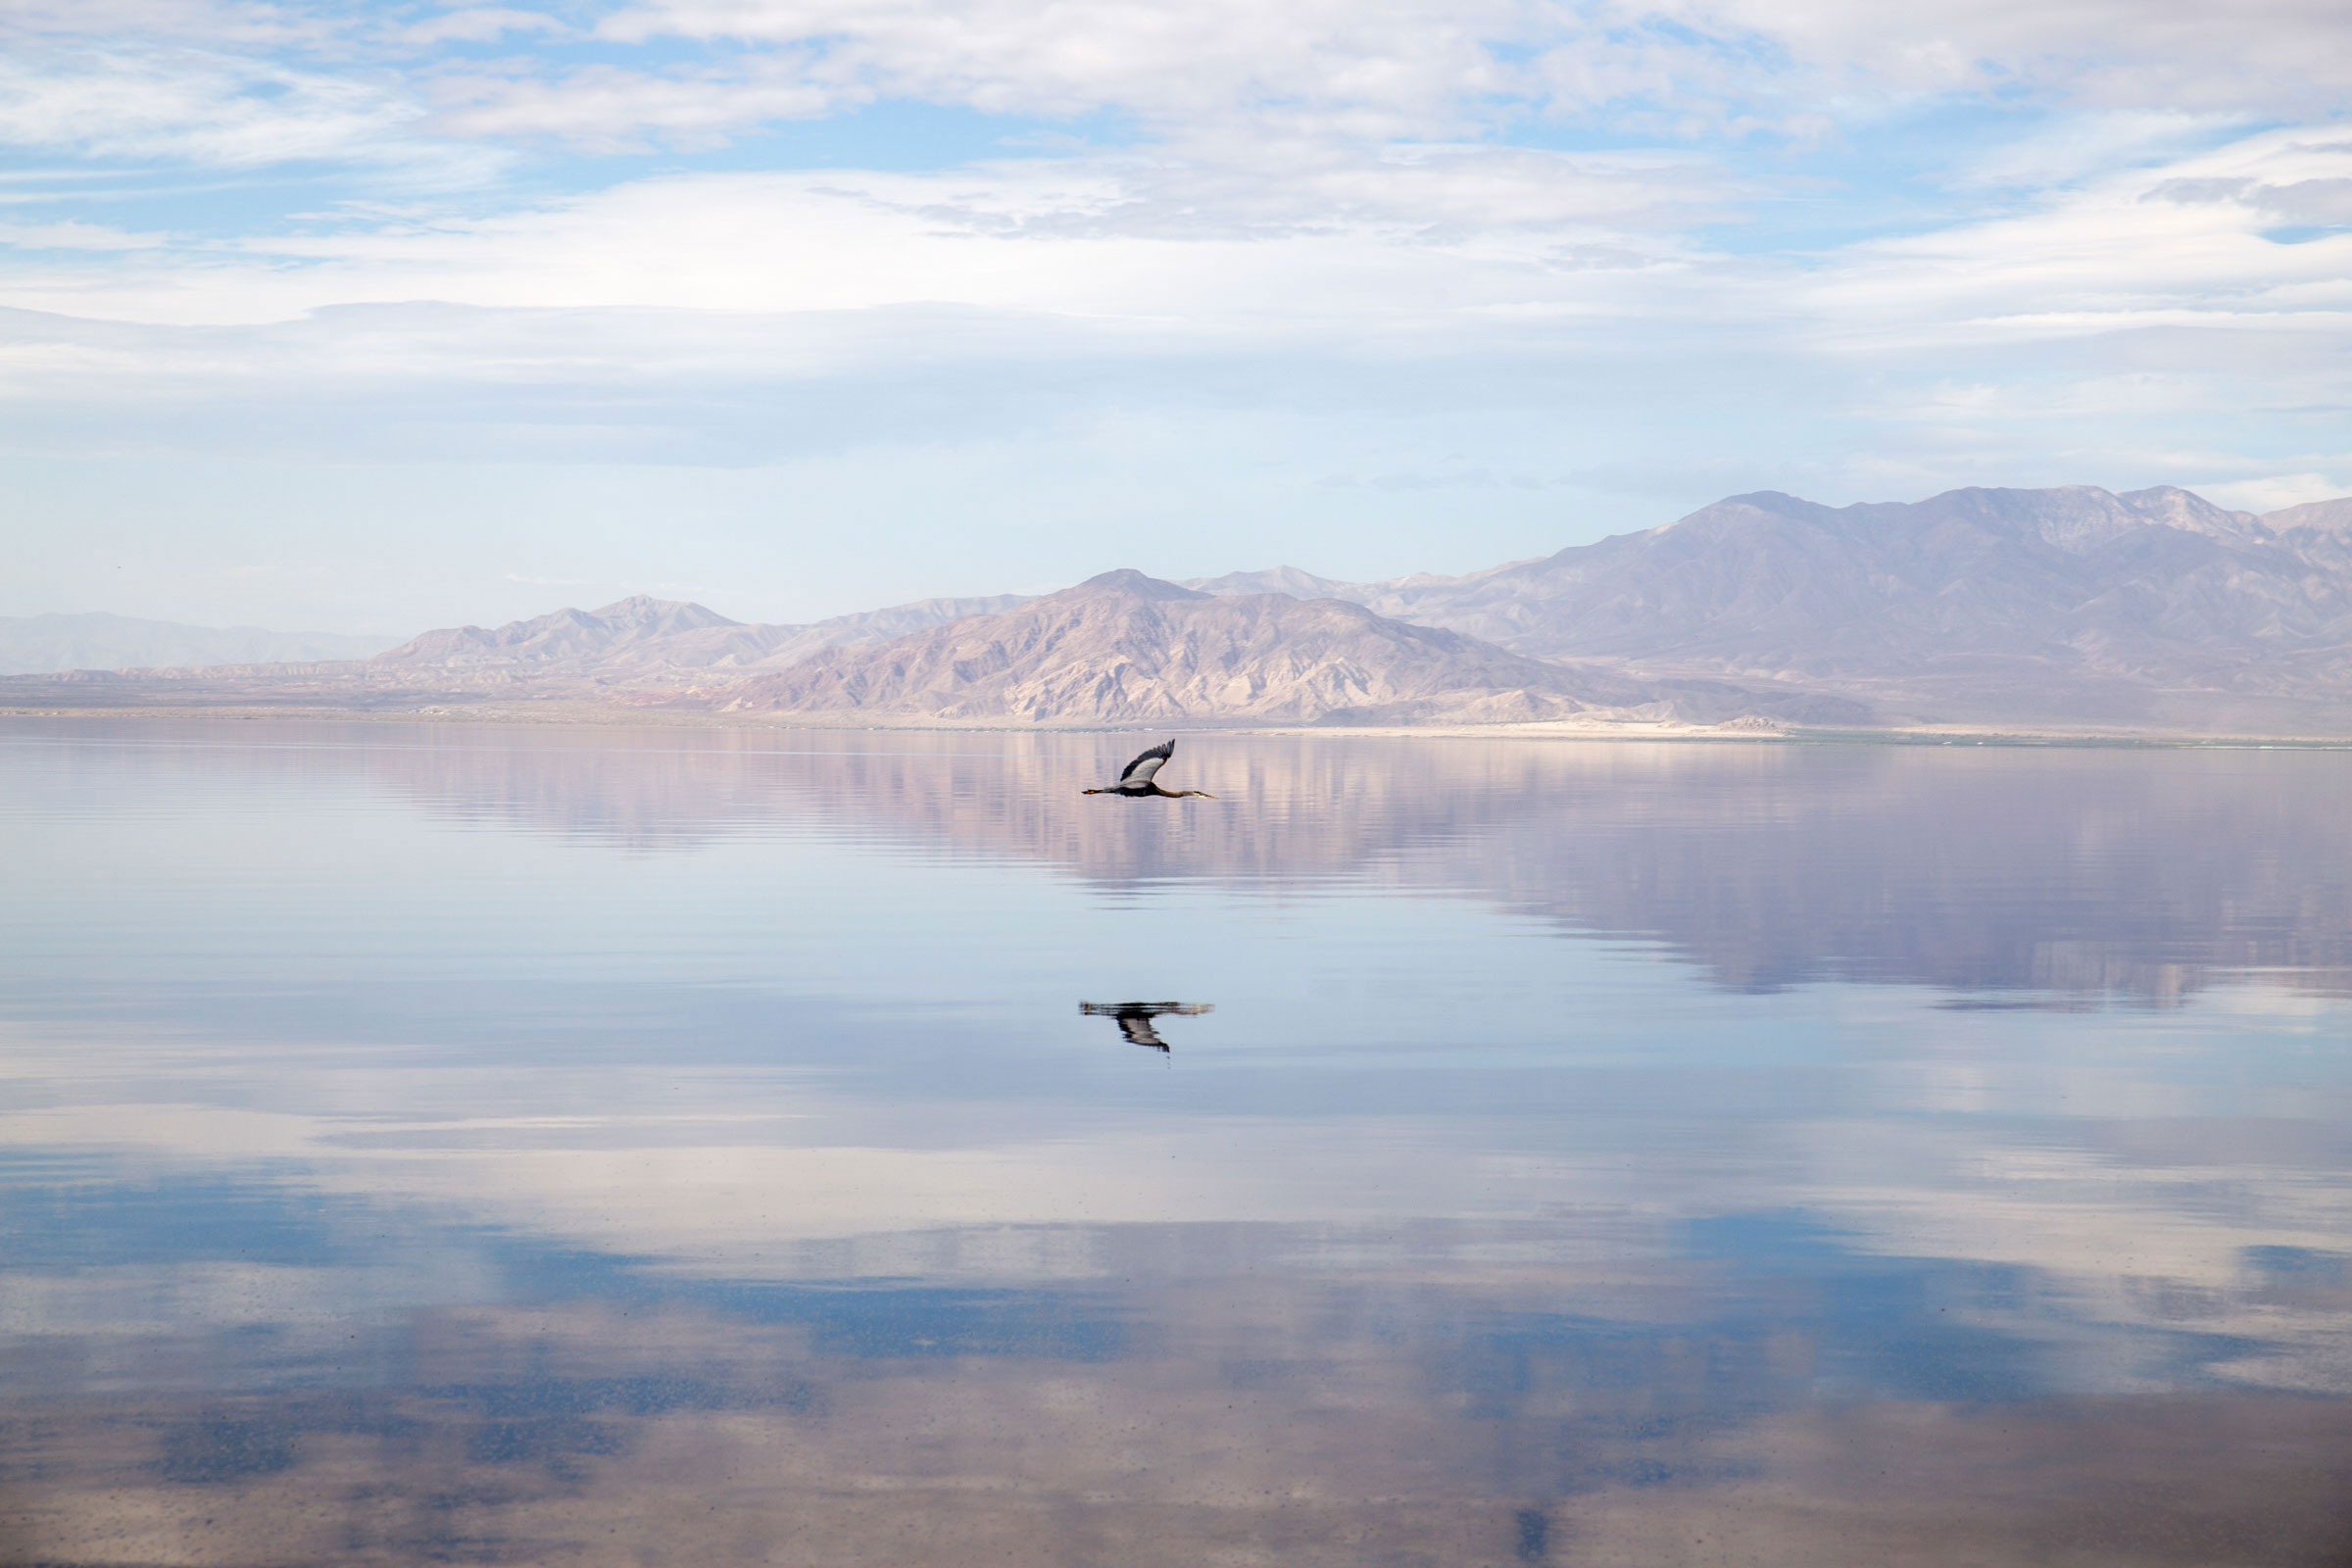 Great Blue Heron flies over the Salton Sea. Mike Fernandez/Audubon